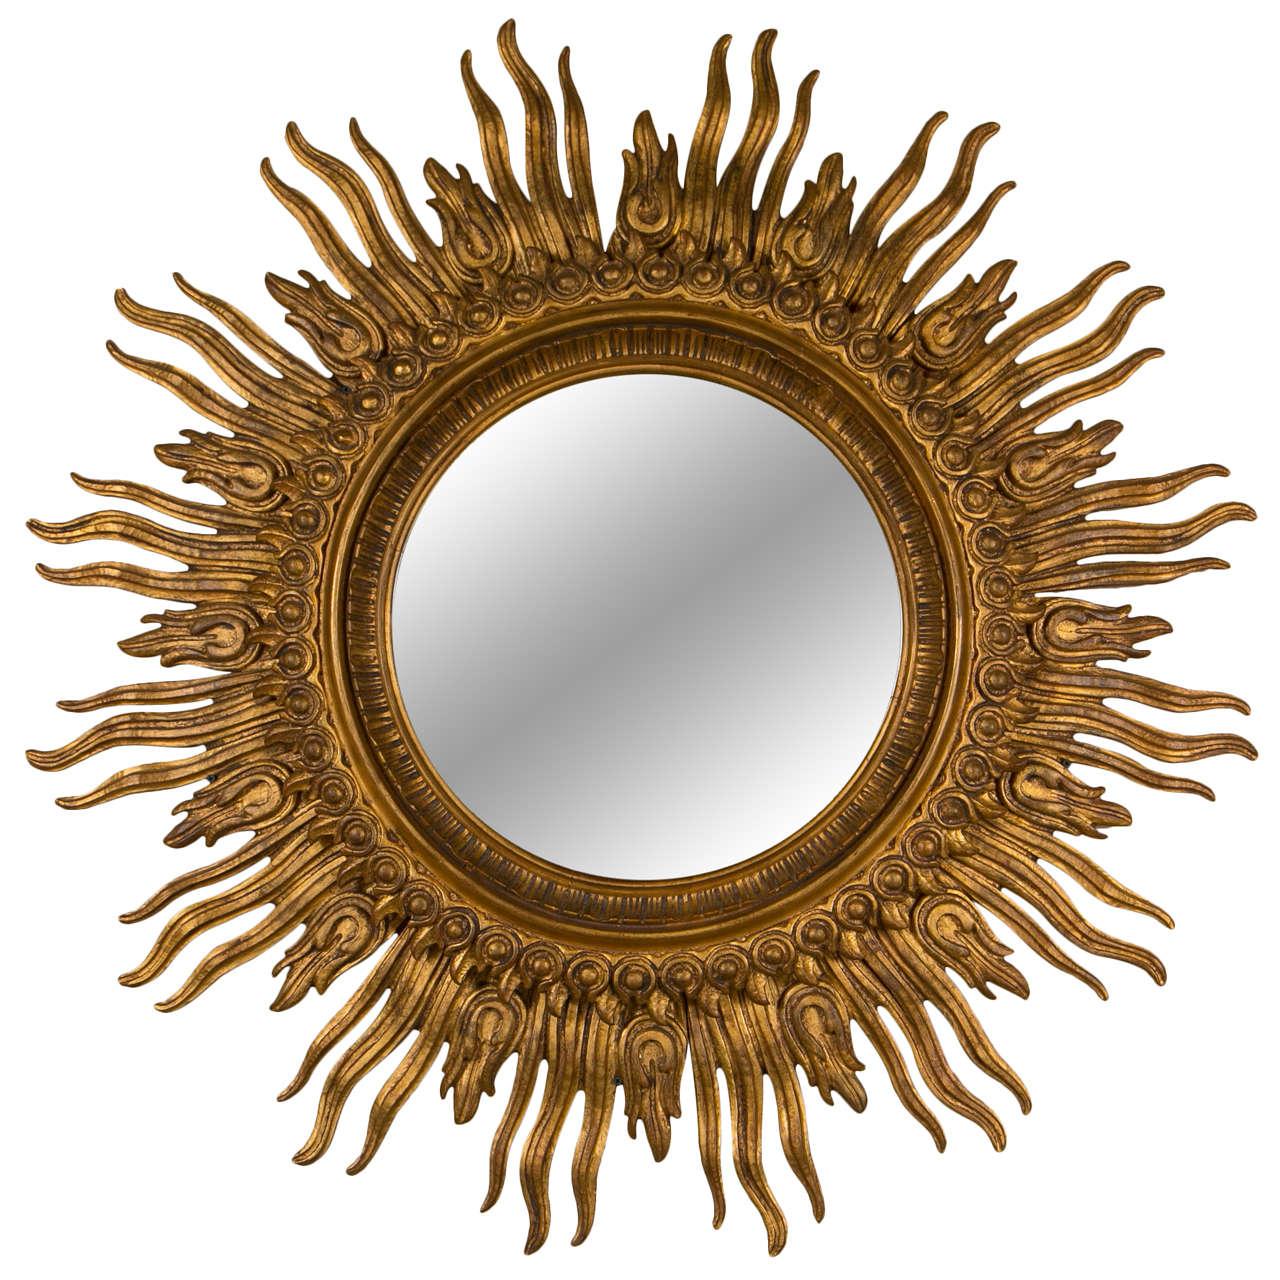 Carved gilt wood sunburst mirror at 1stdibs for Sunburst mirror